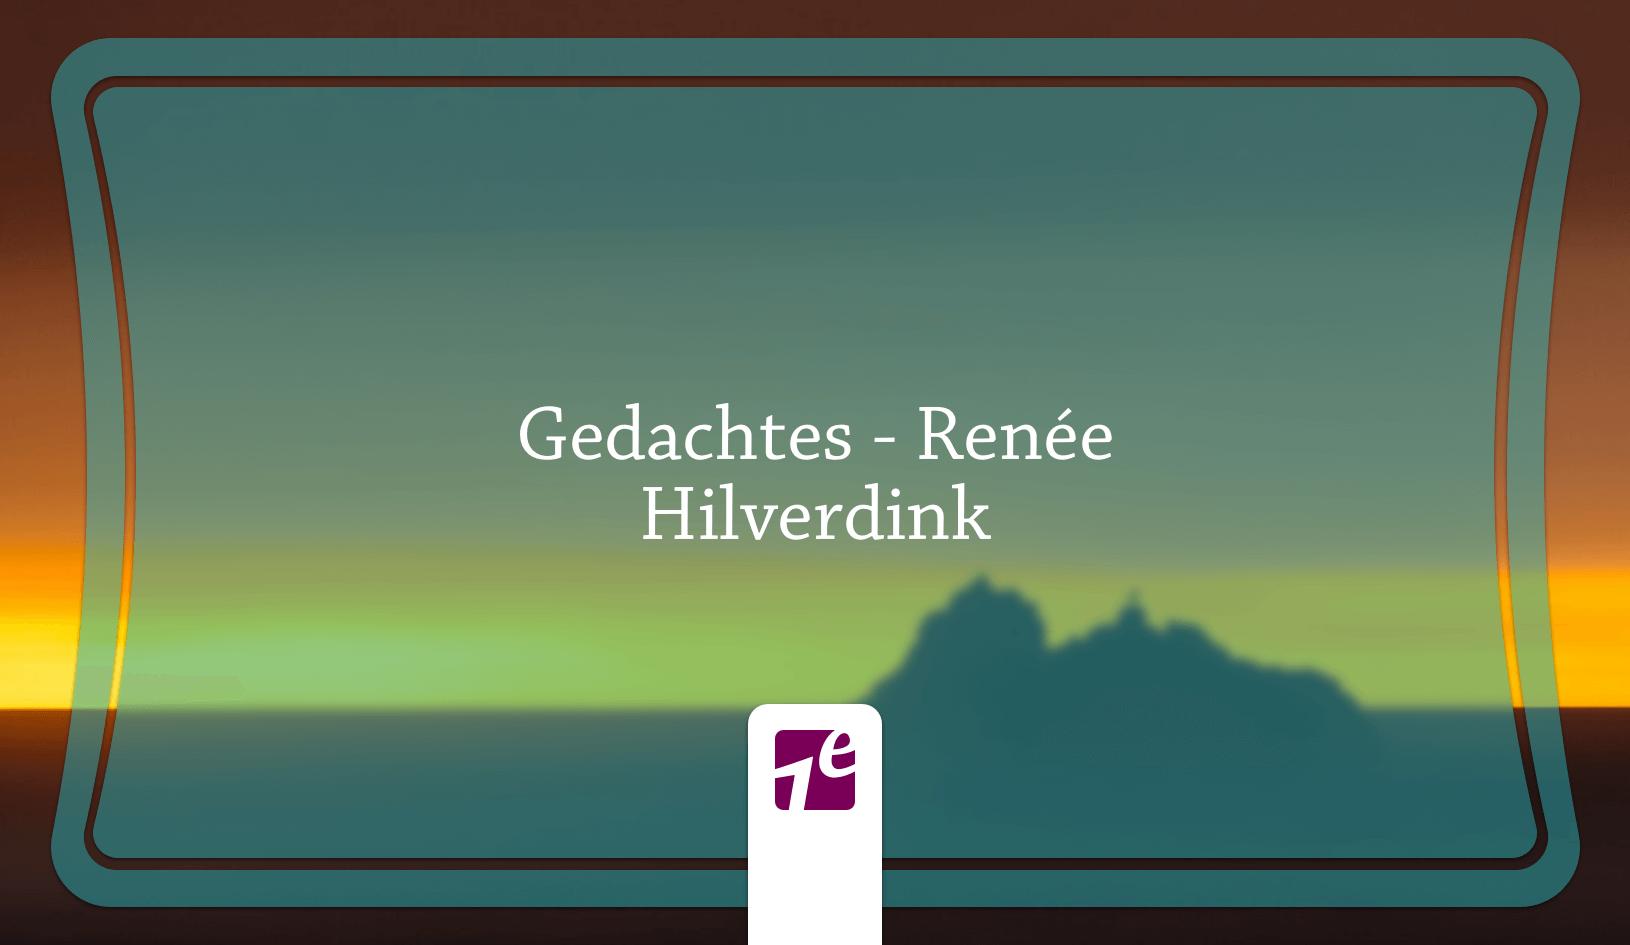 Gedachtes – Renée Hilverdink